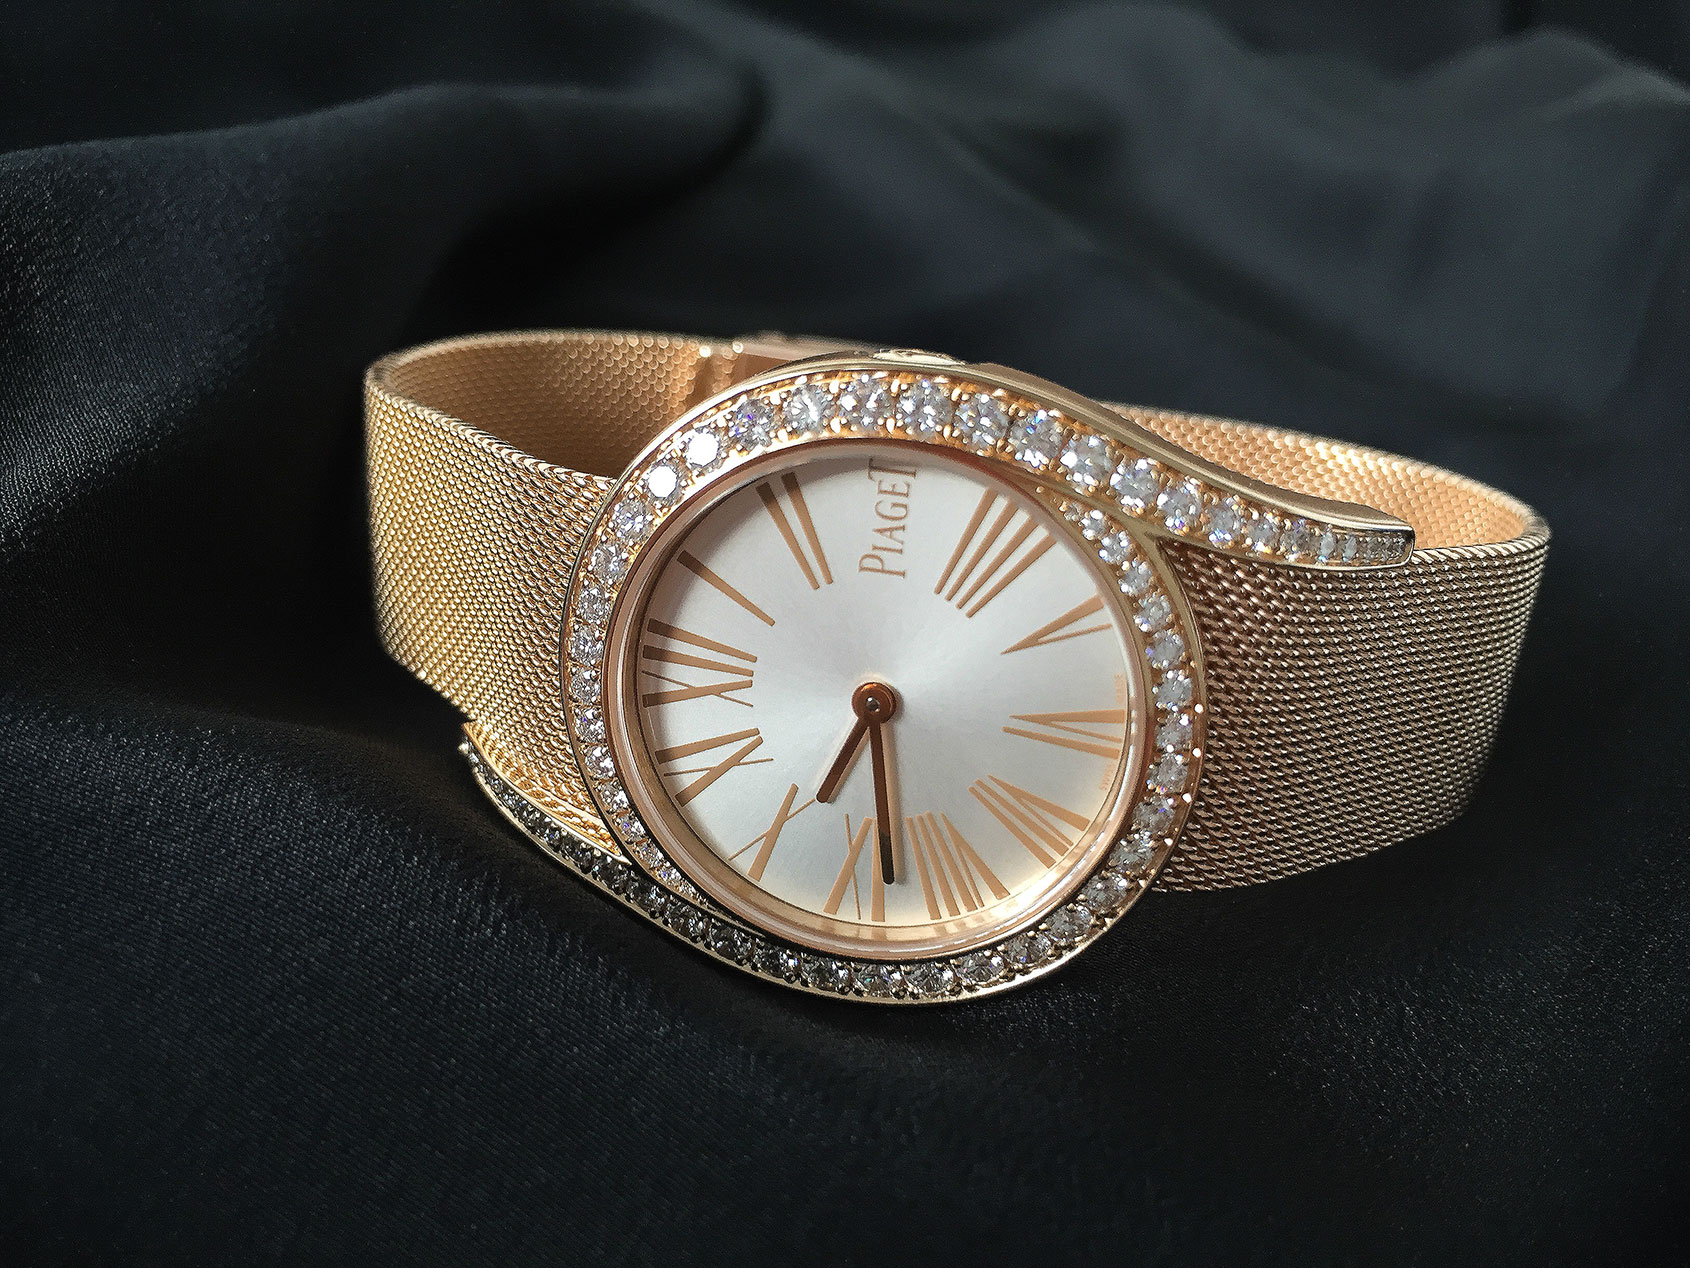 Piaget Limelight Gala Winner Of The GPHG Ladies Watch